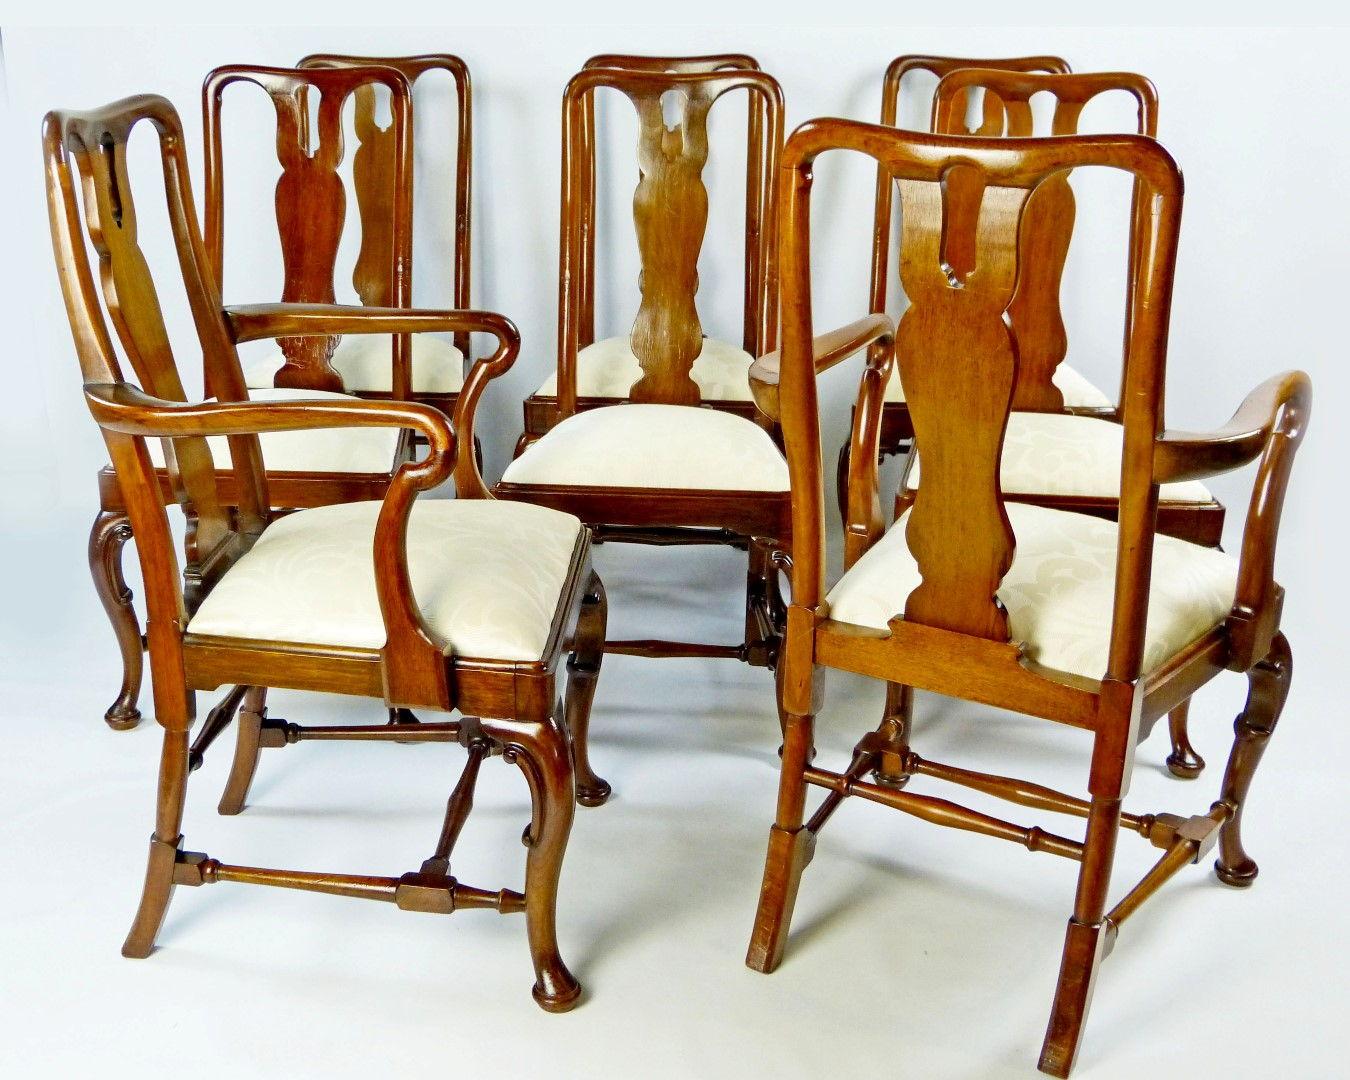 Antique furniture antique cupboards antique tables  : 239EBFD3 5AB0 0200 04A5 C236249CE66E from www.anticuarium.net size 1350 x 1080 jpeg 224kB